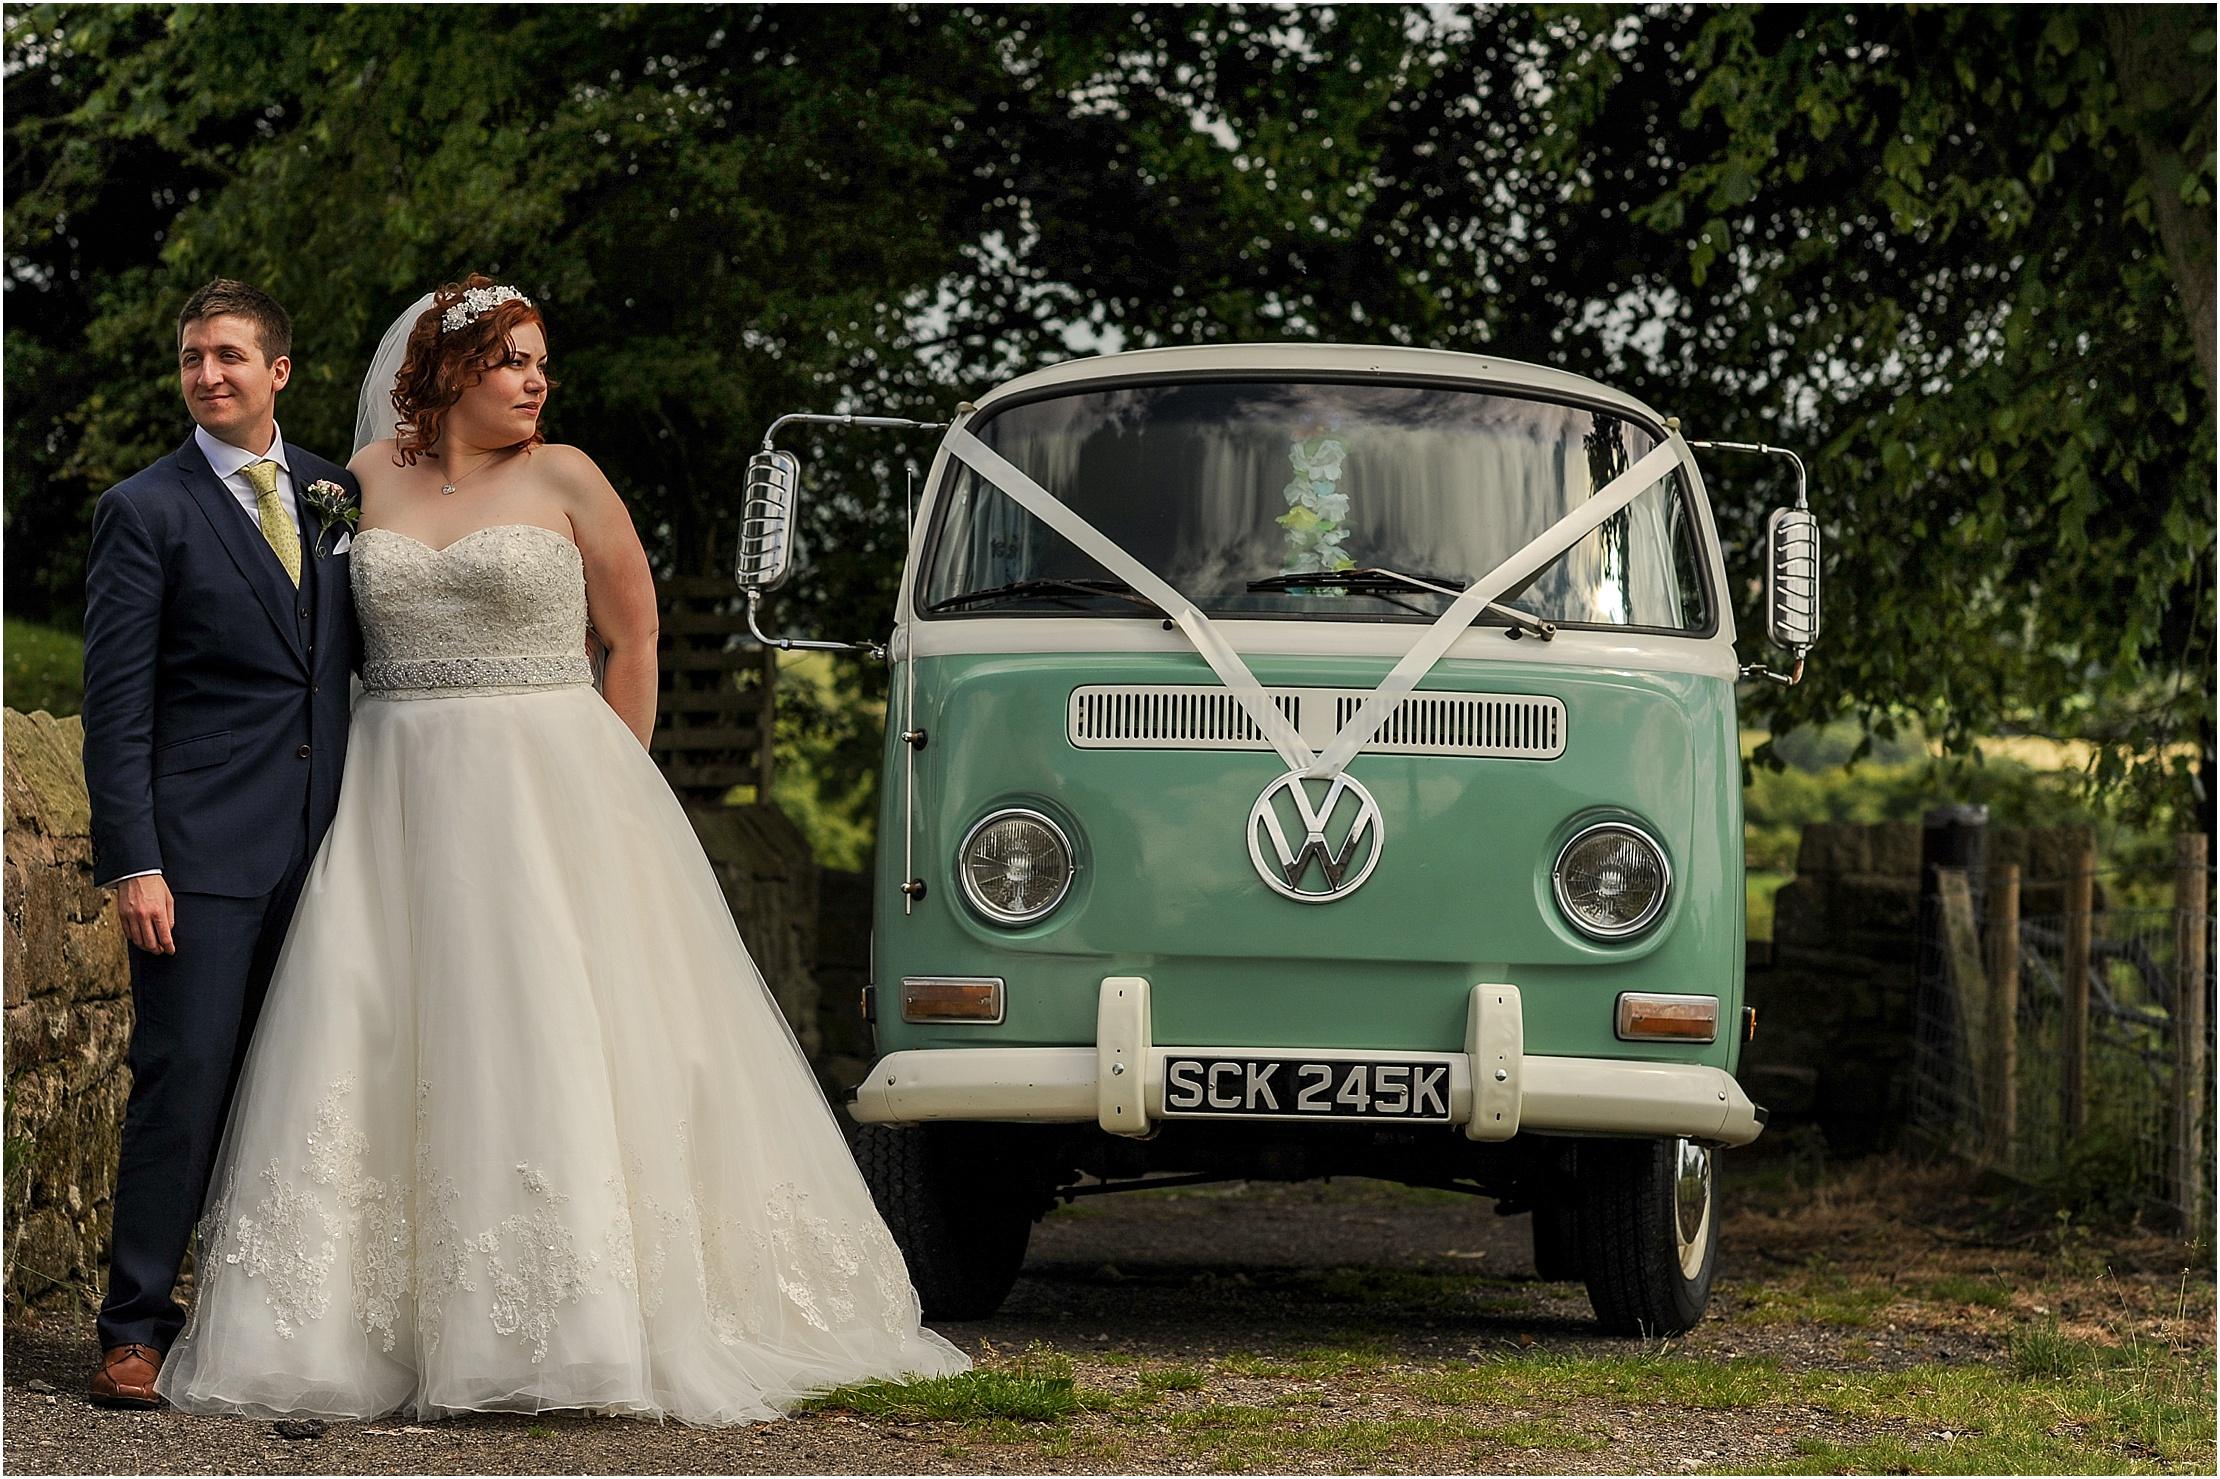 shireburn-arms-wedding- 077.jpg